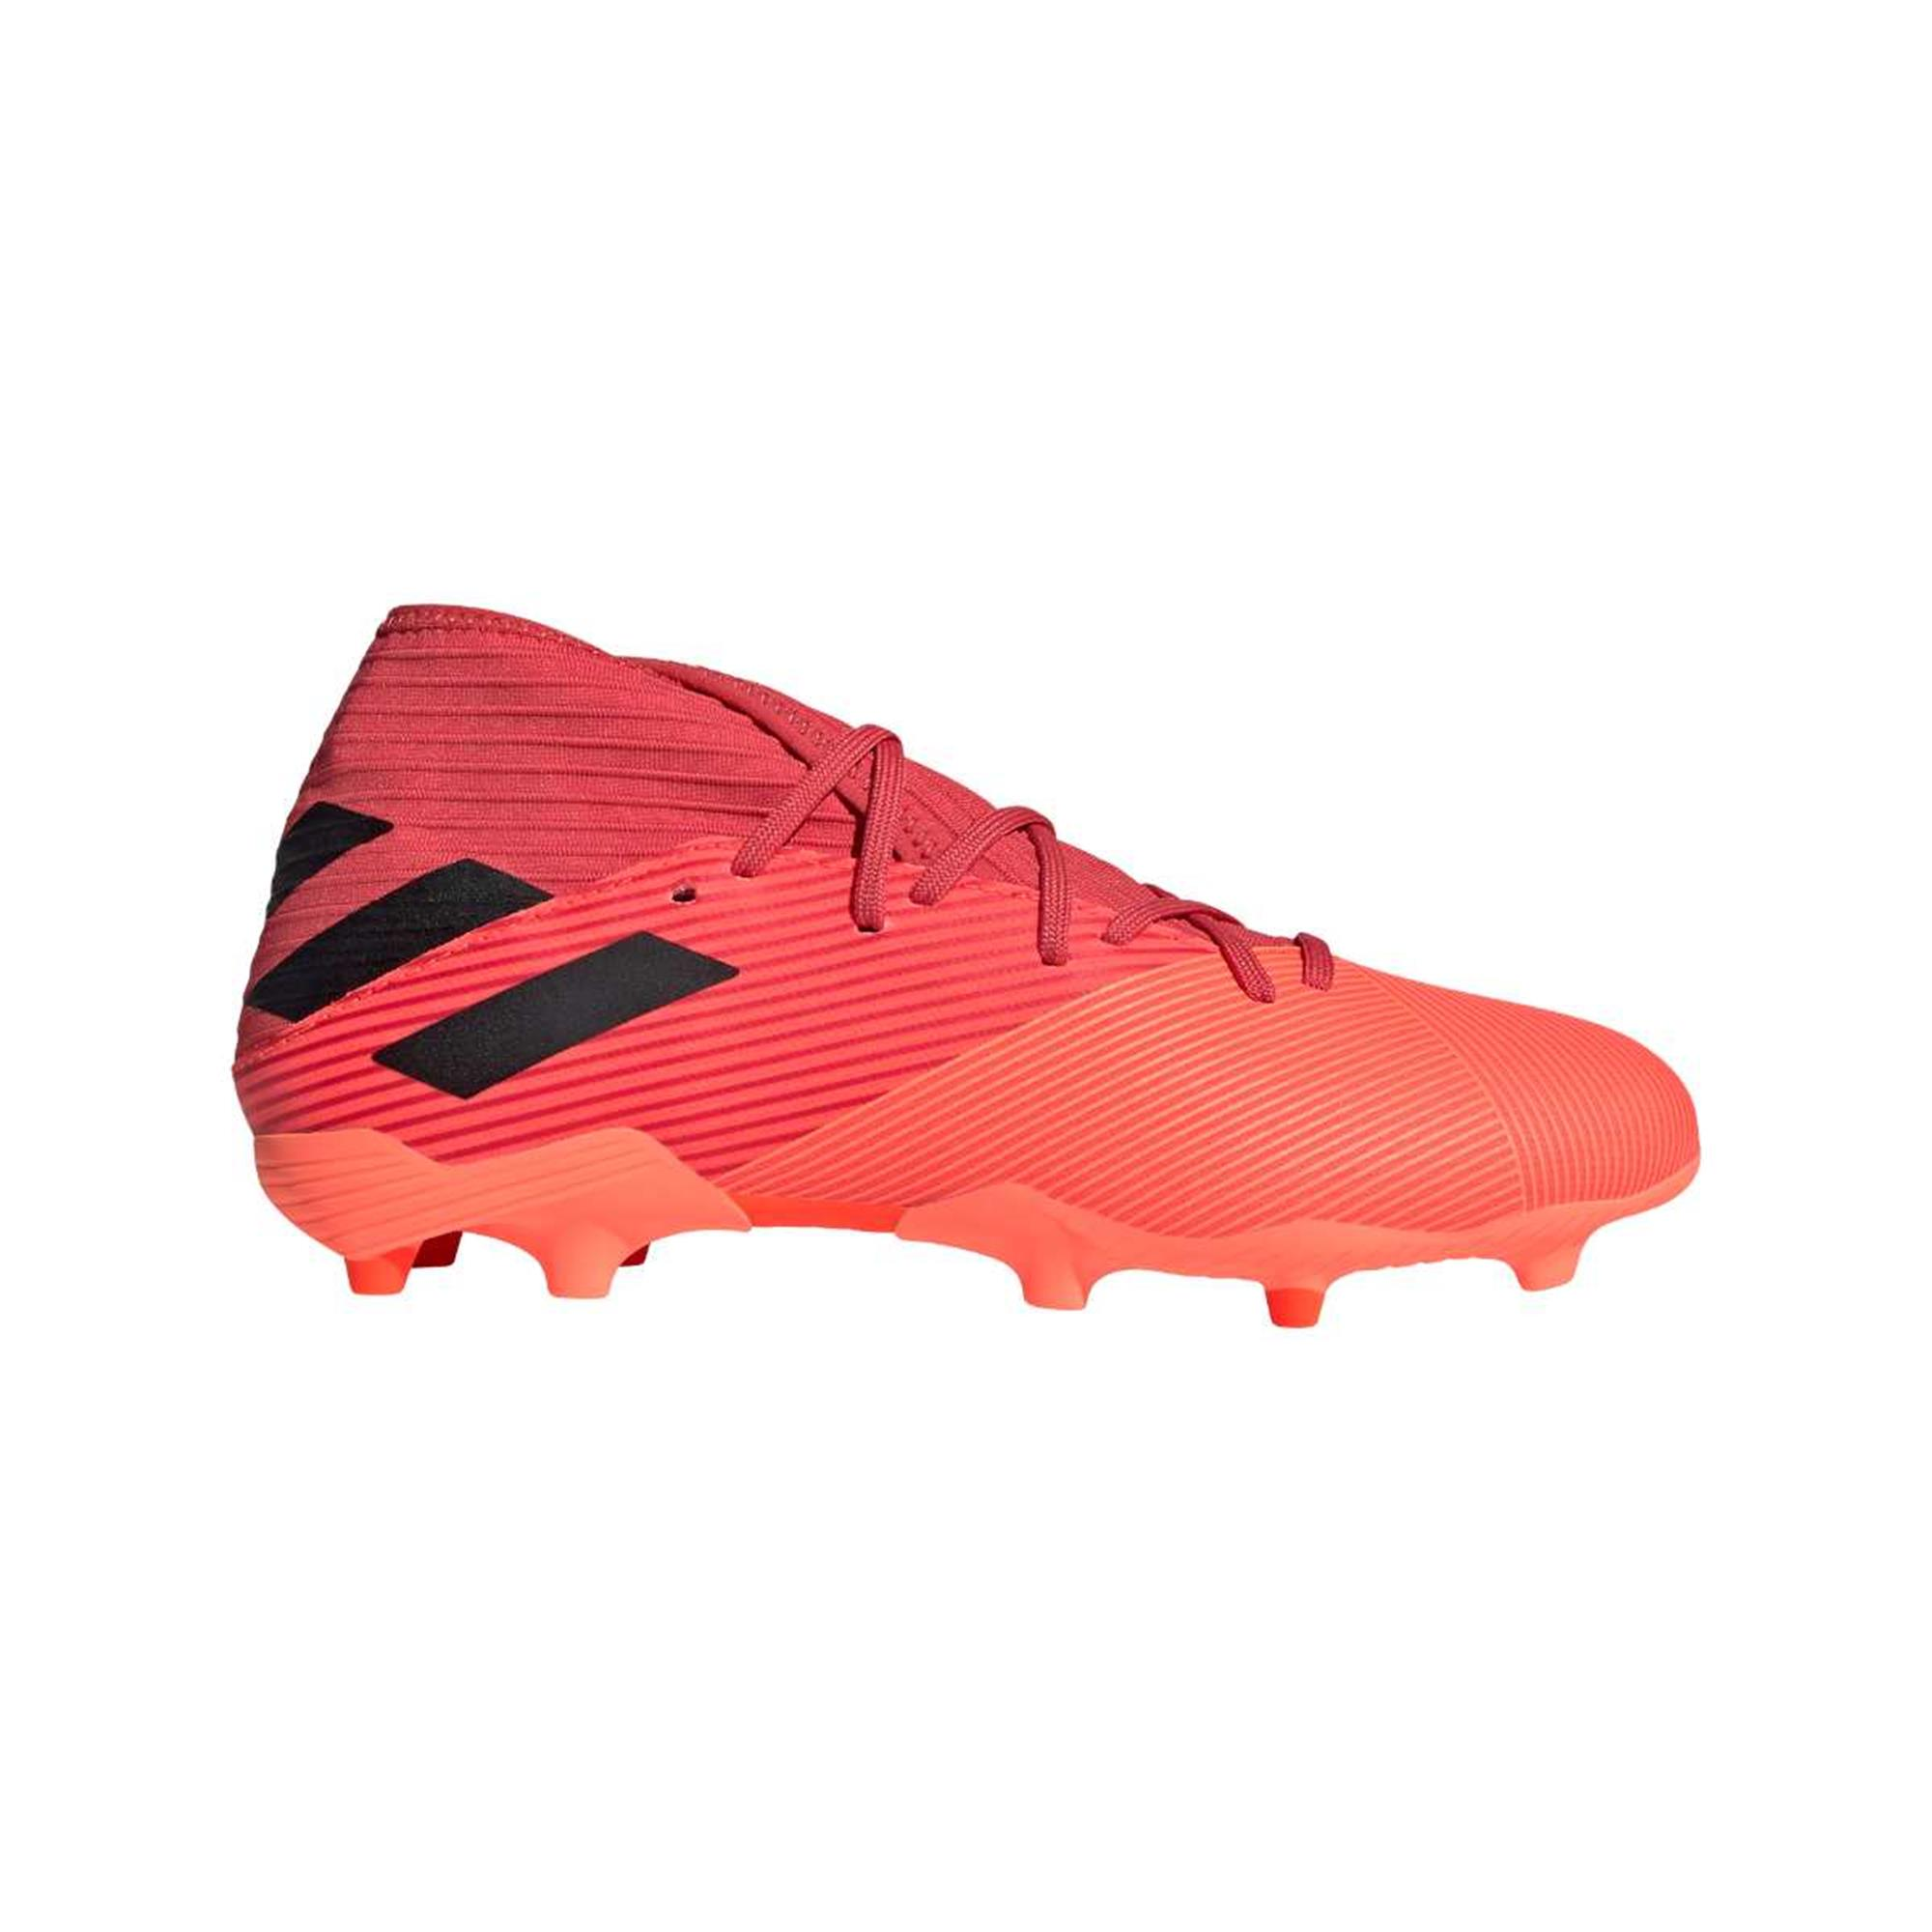 Rood/oranje voetbalschoenen Adidas Nemeziz 19.3 FG - EH0300